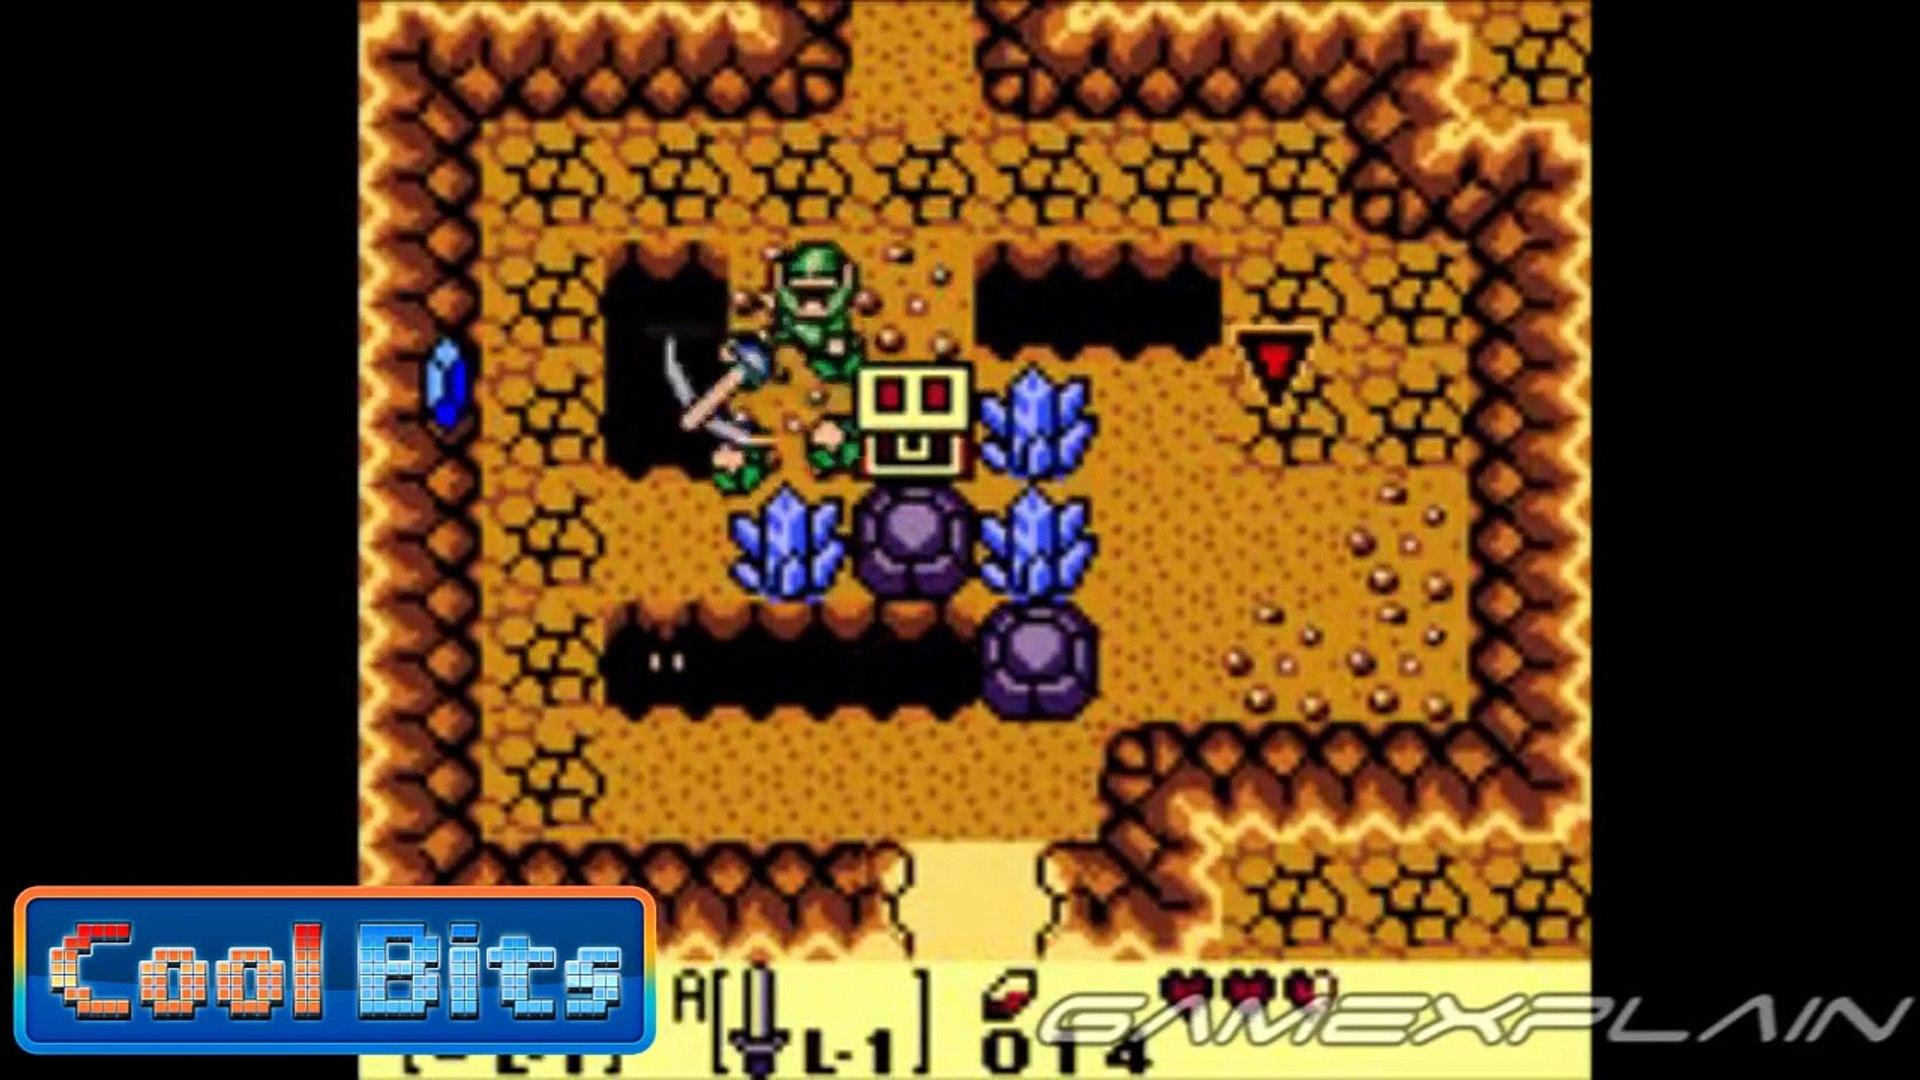 Cool Bits - Zelda: Link's Awakening's Stealing Secret (THIEF!)